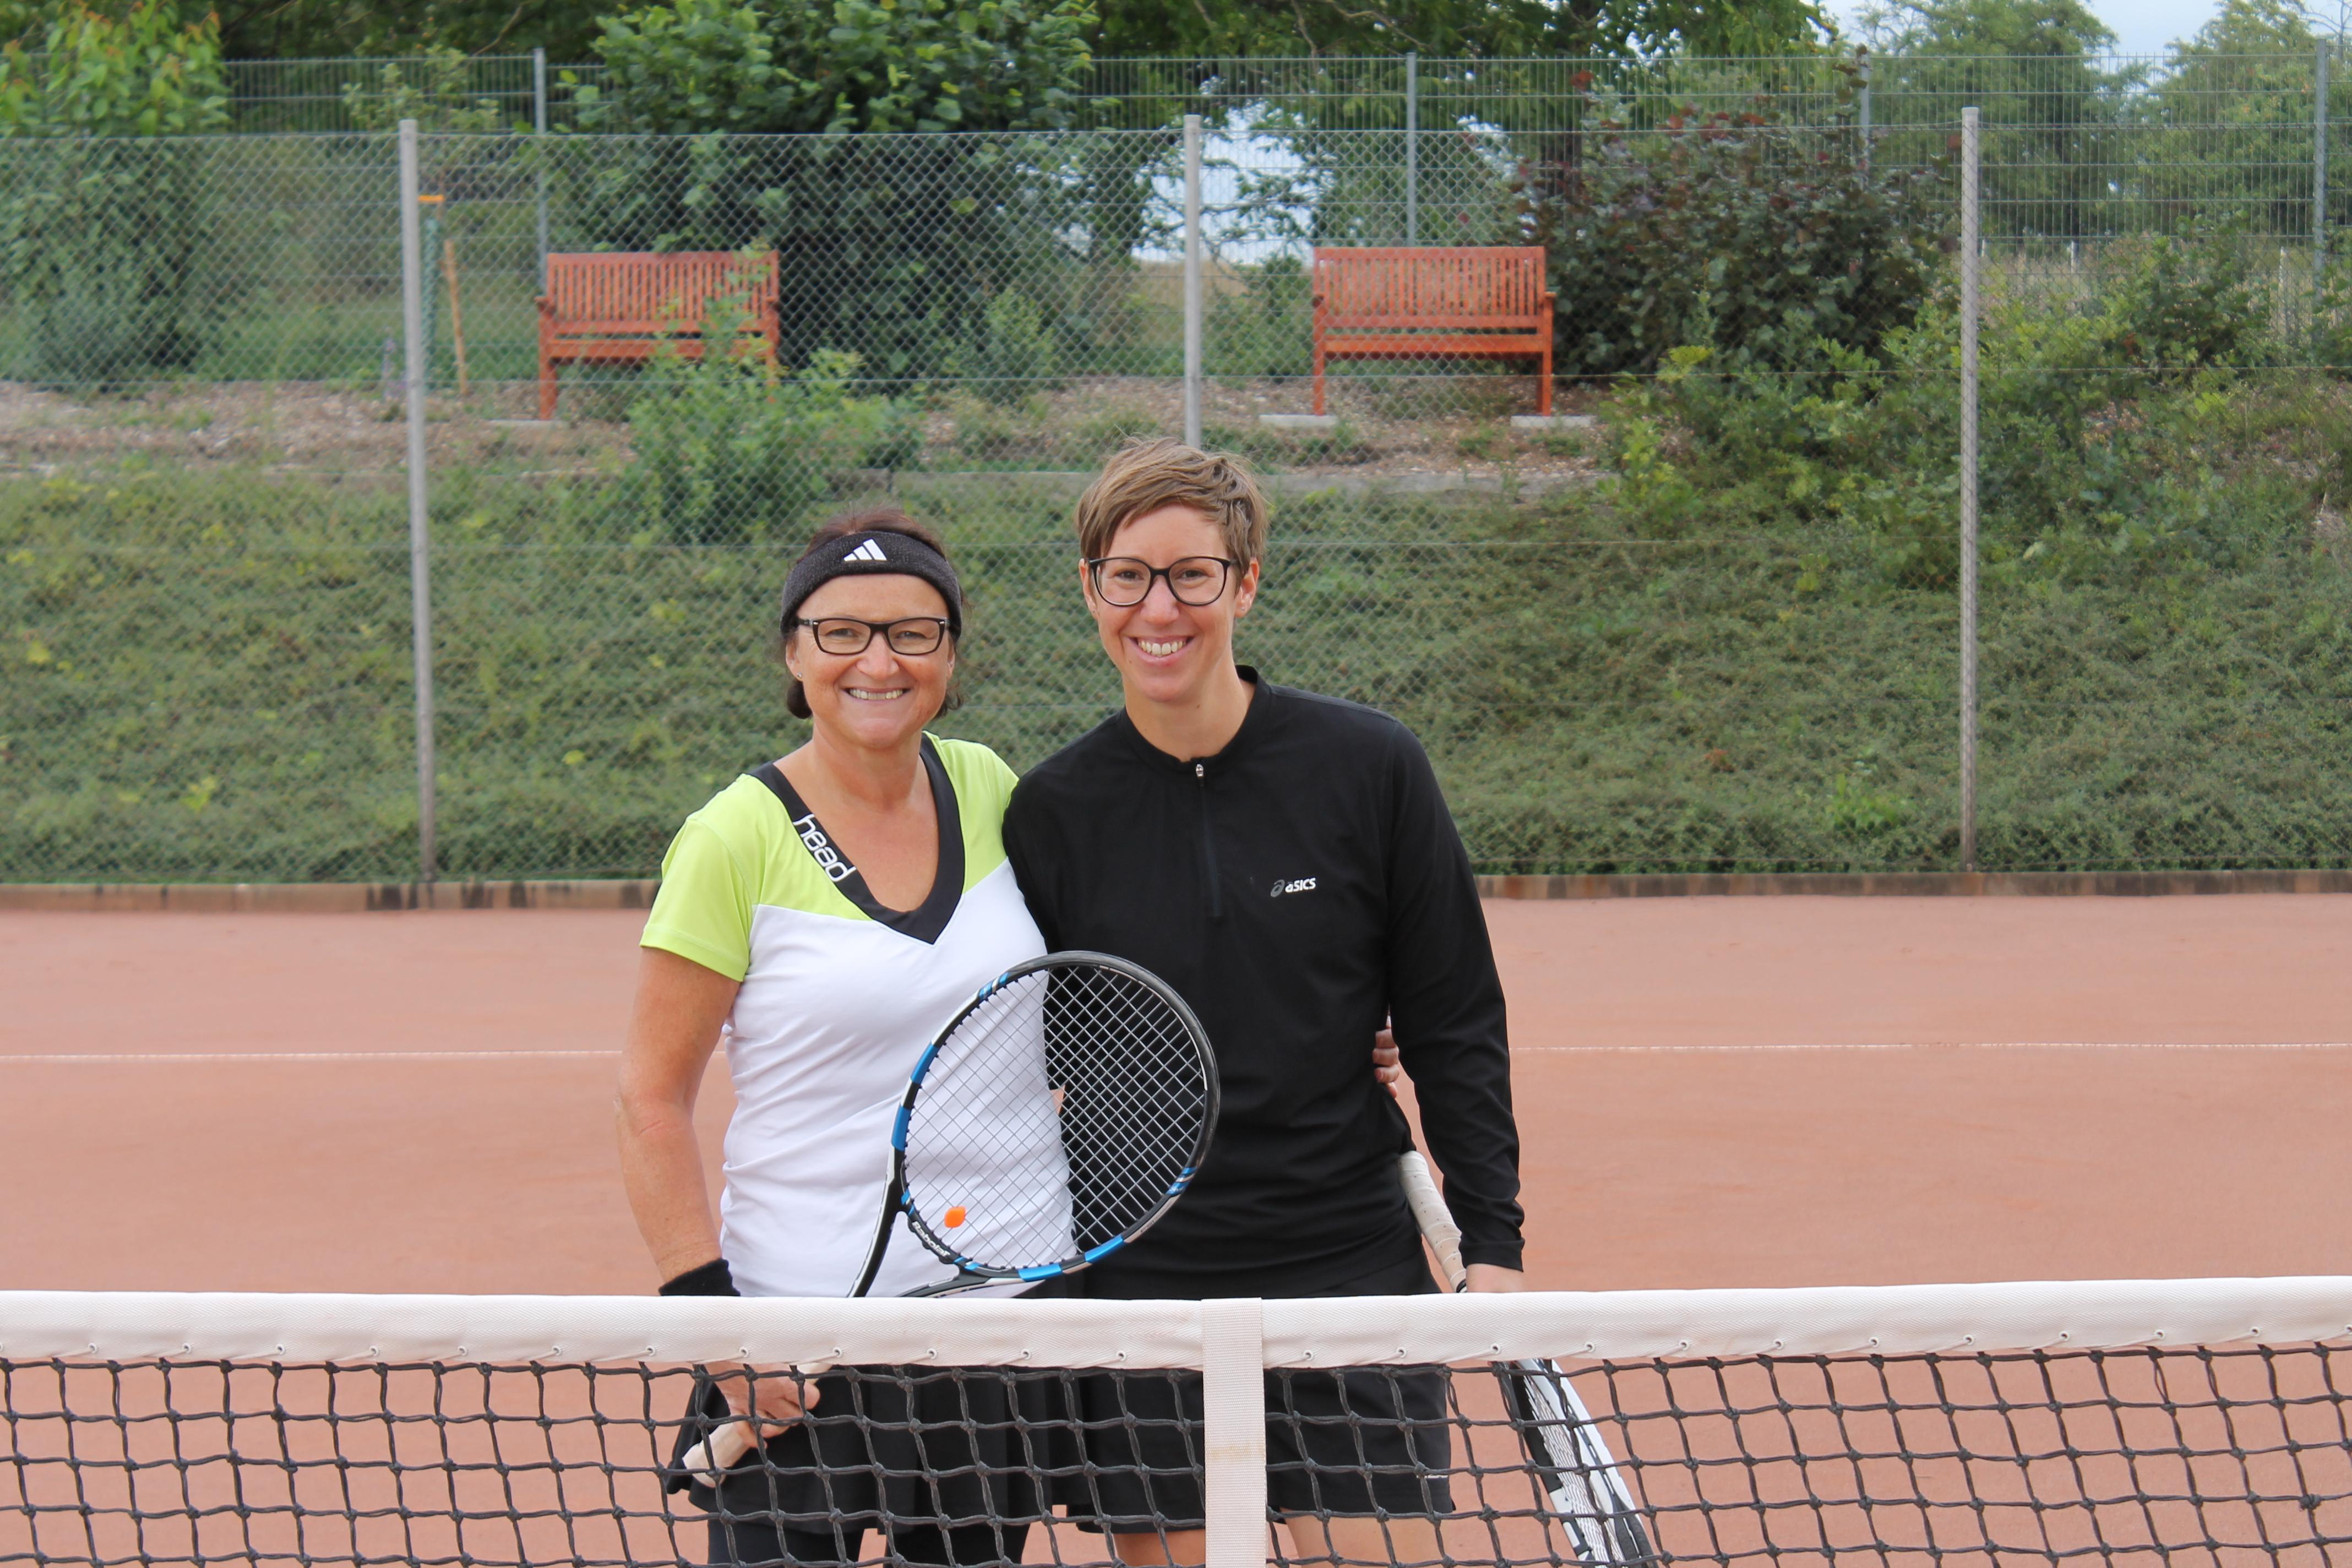 Clubmeisterin und Vize-Clubmeisterin. Diana Jakob (links) und Andrea Kurreck (rechts)